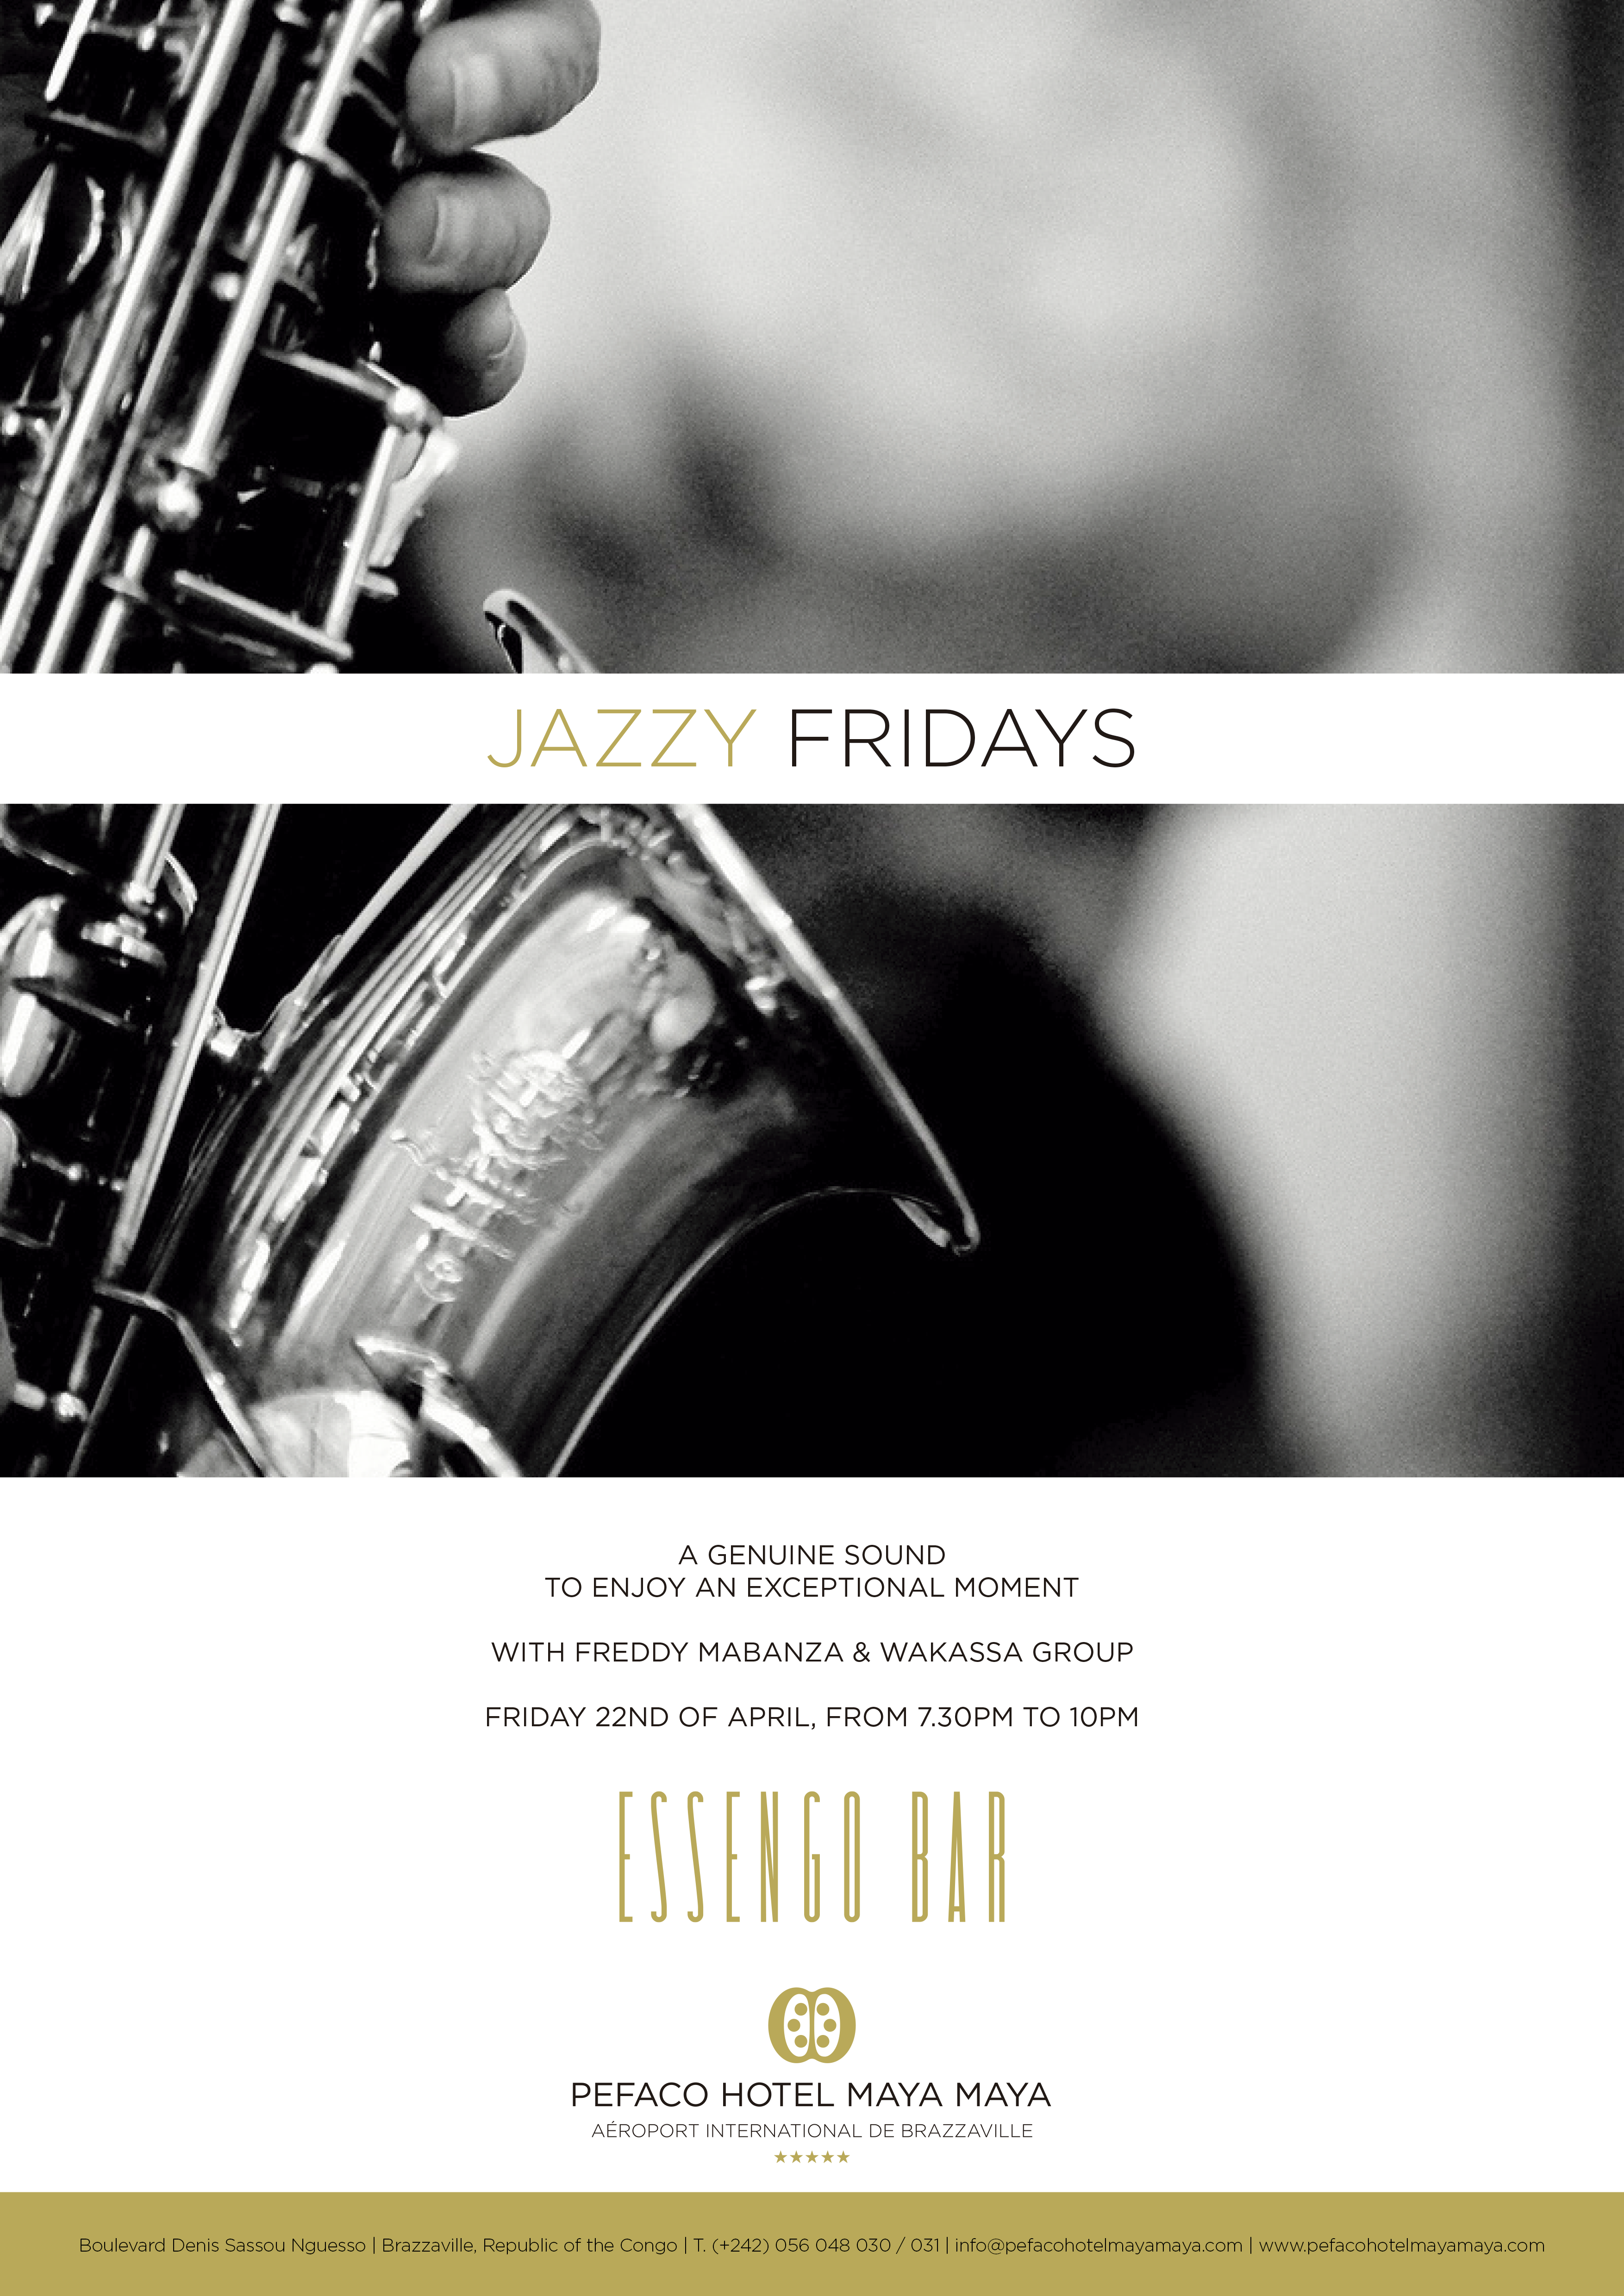 Jazzy-Fridays-1st-edition